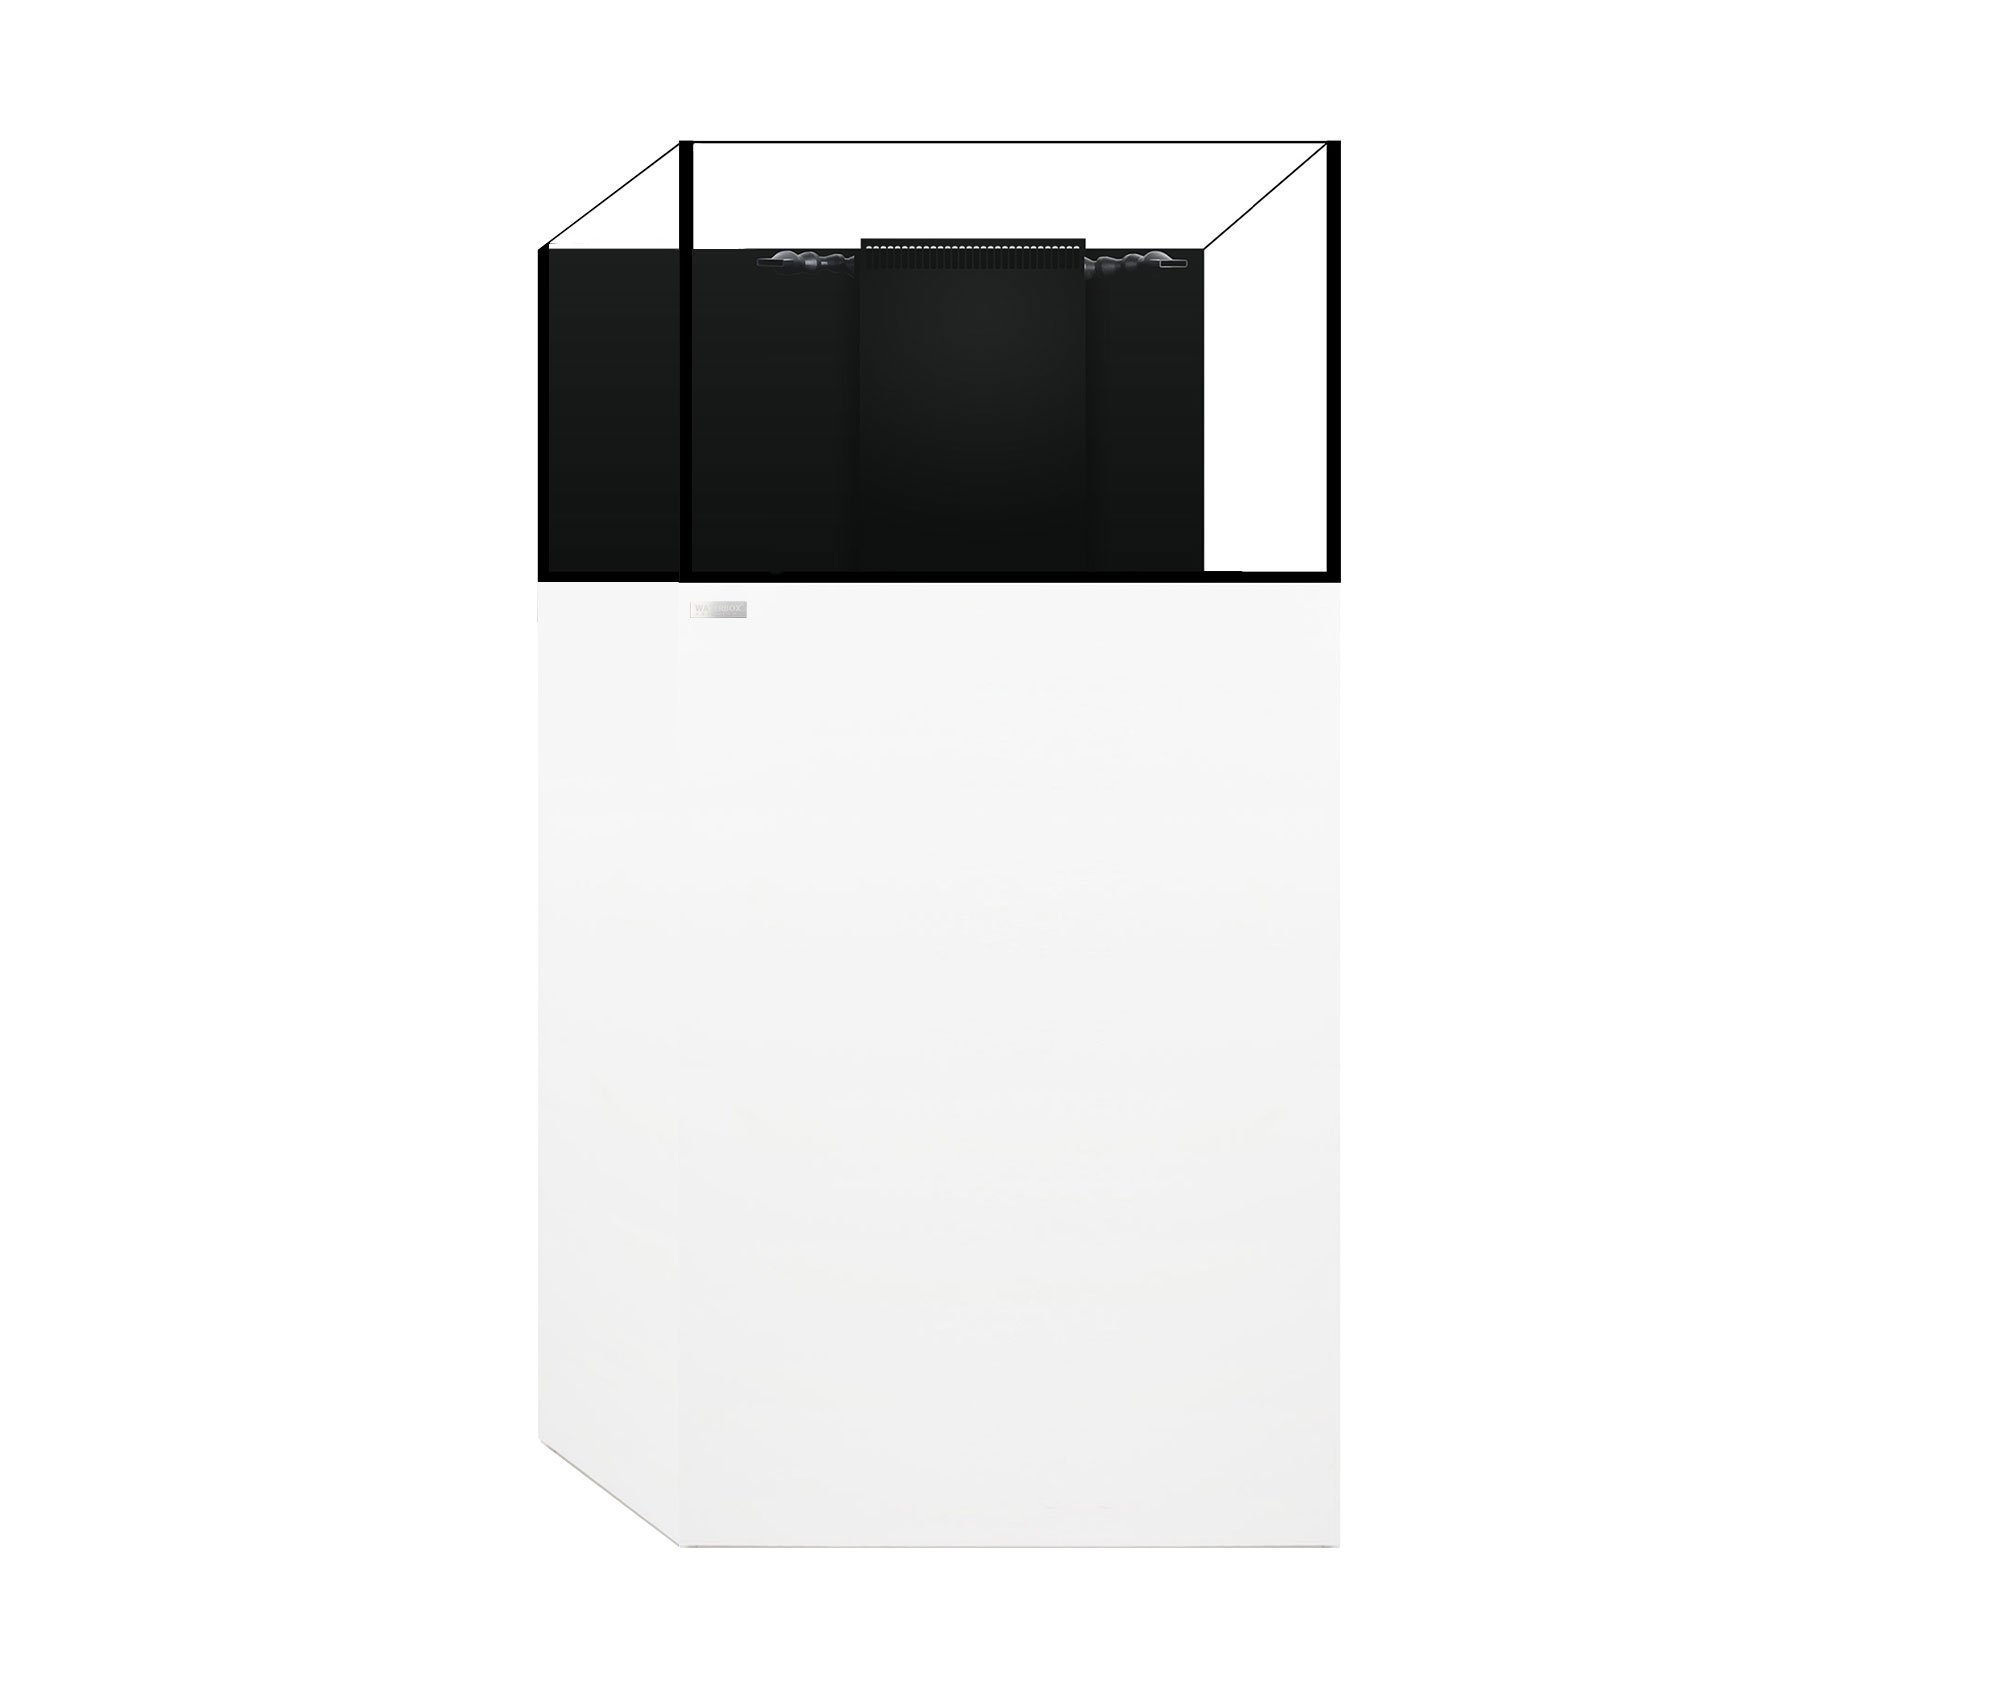 Waterbox FRAG 55.2